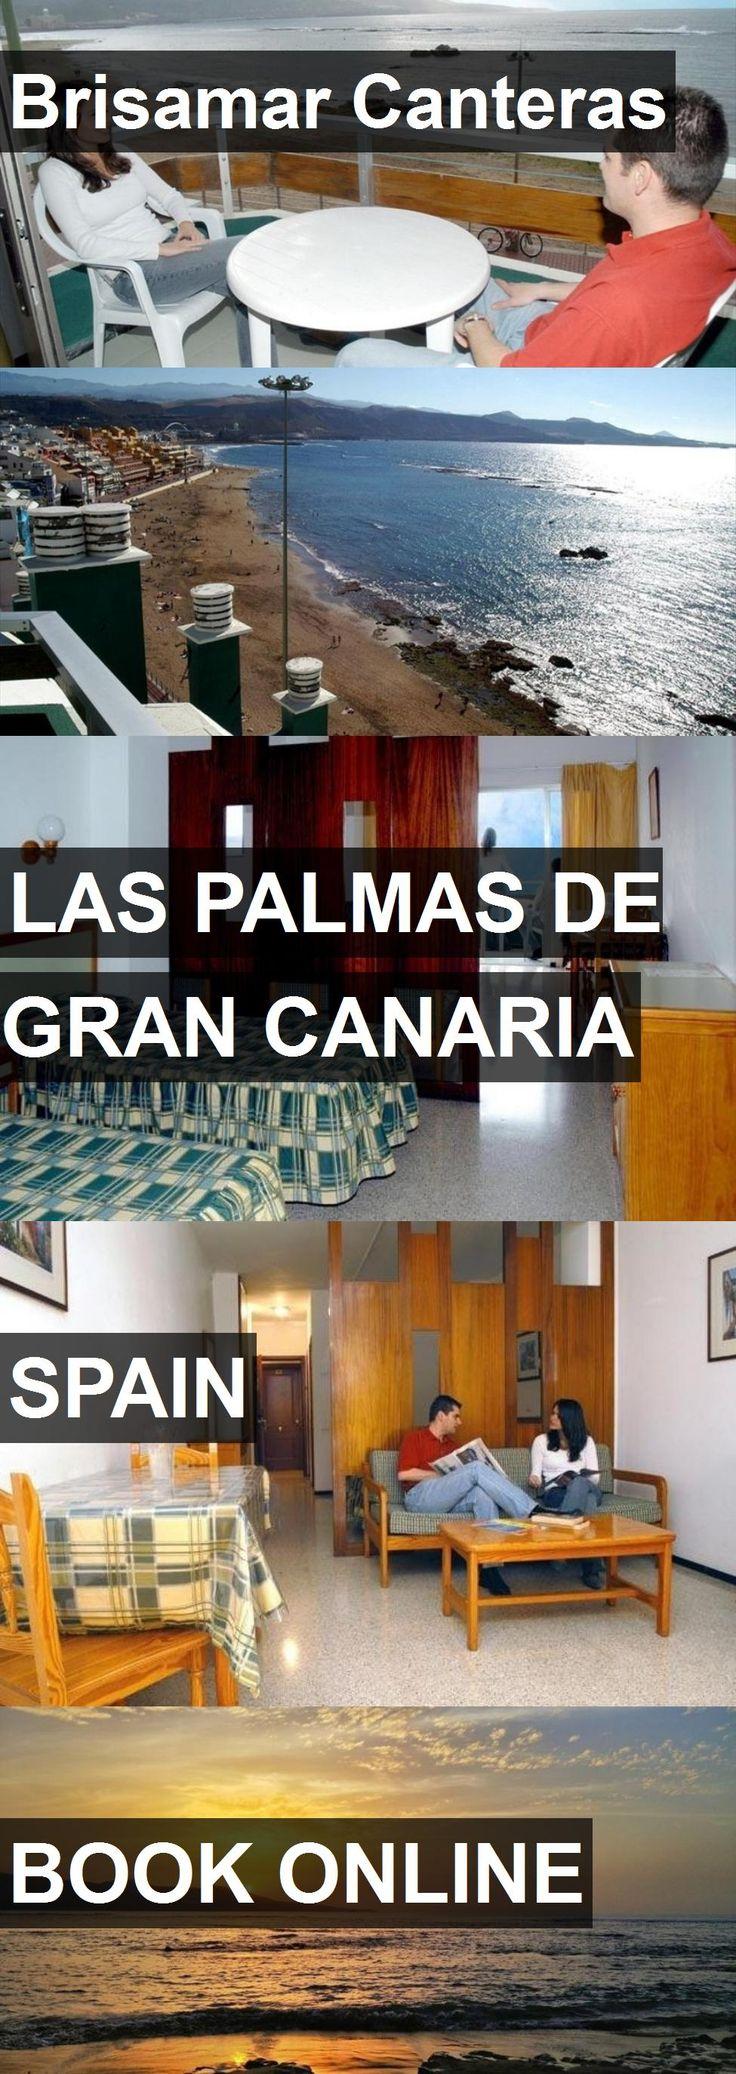 Hotel Brisamar Canteras in Las Palmas de Gran Canaria, Spain. For more information, photos, reviews and best prices please follow the link. #Spain #LasPalmasdeGranCanaria #travel #vacation #hotel